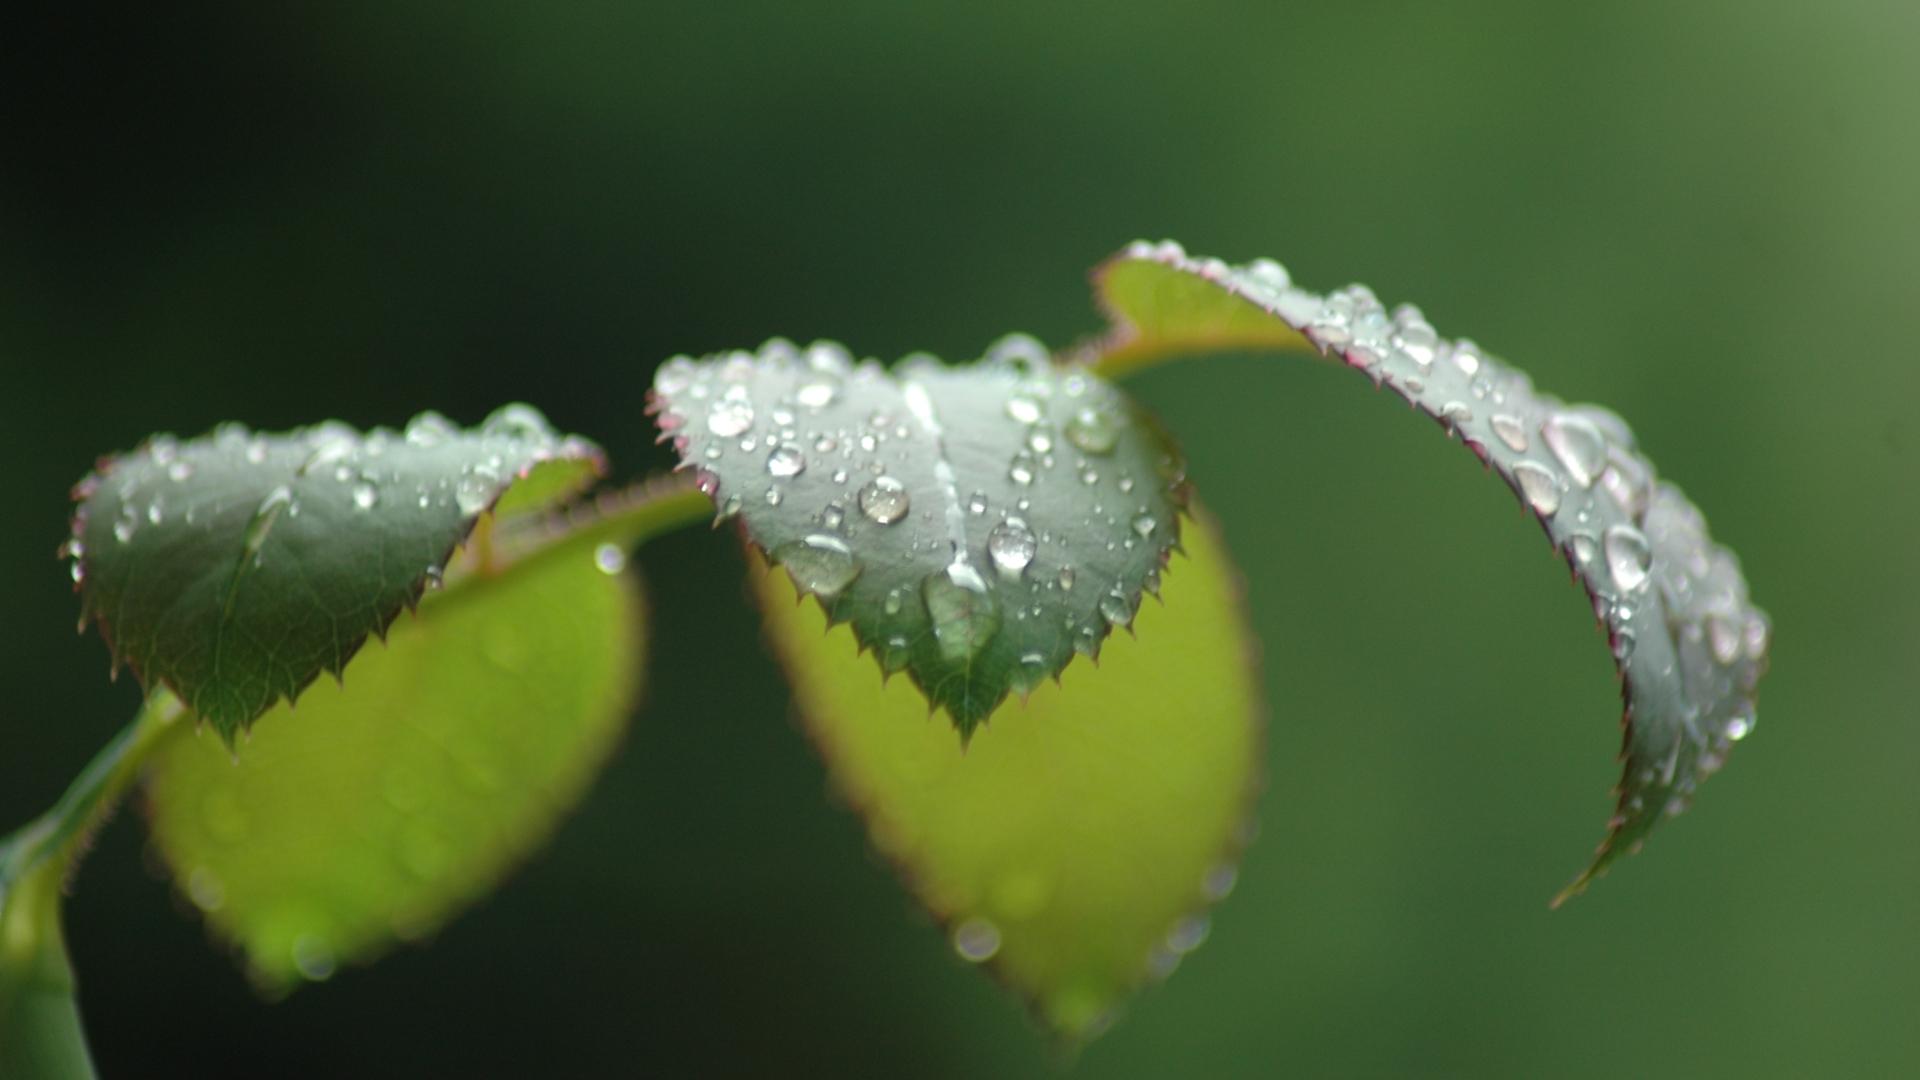 1080p leaves